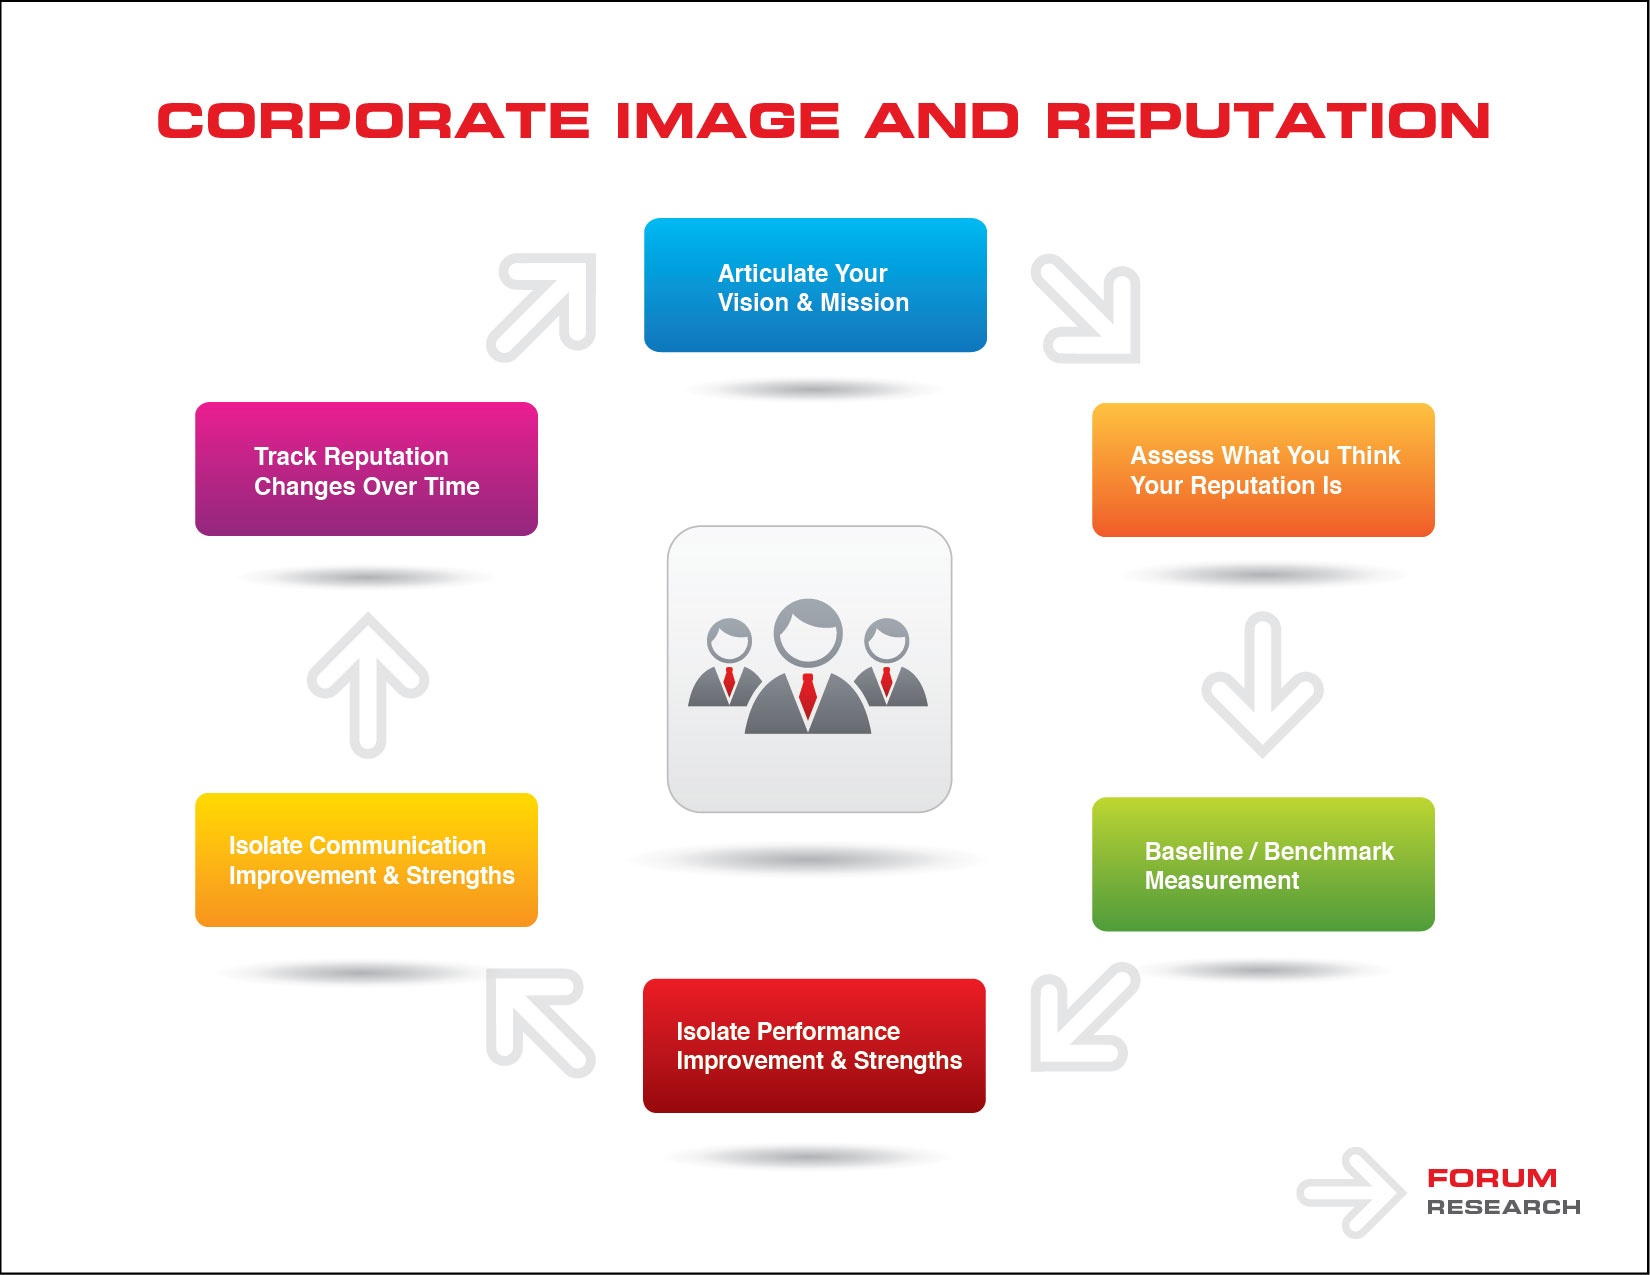 CorporateImageReputation1.jpg